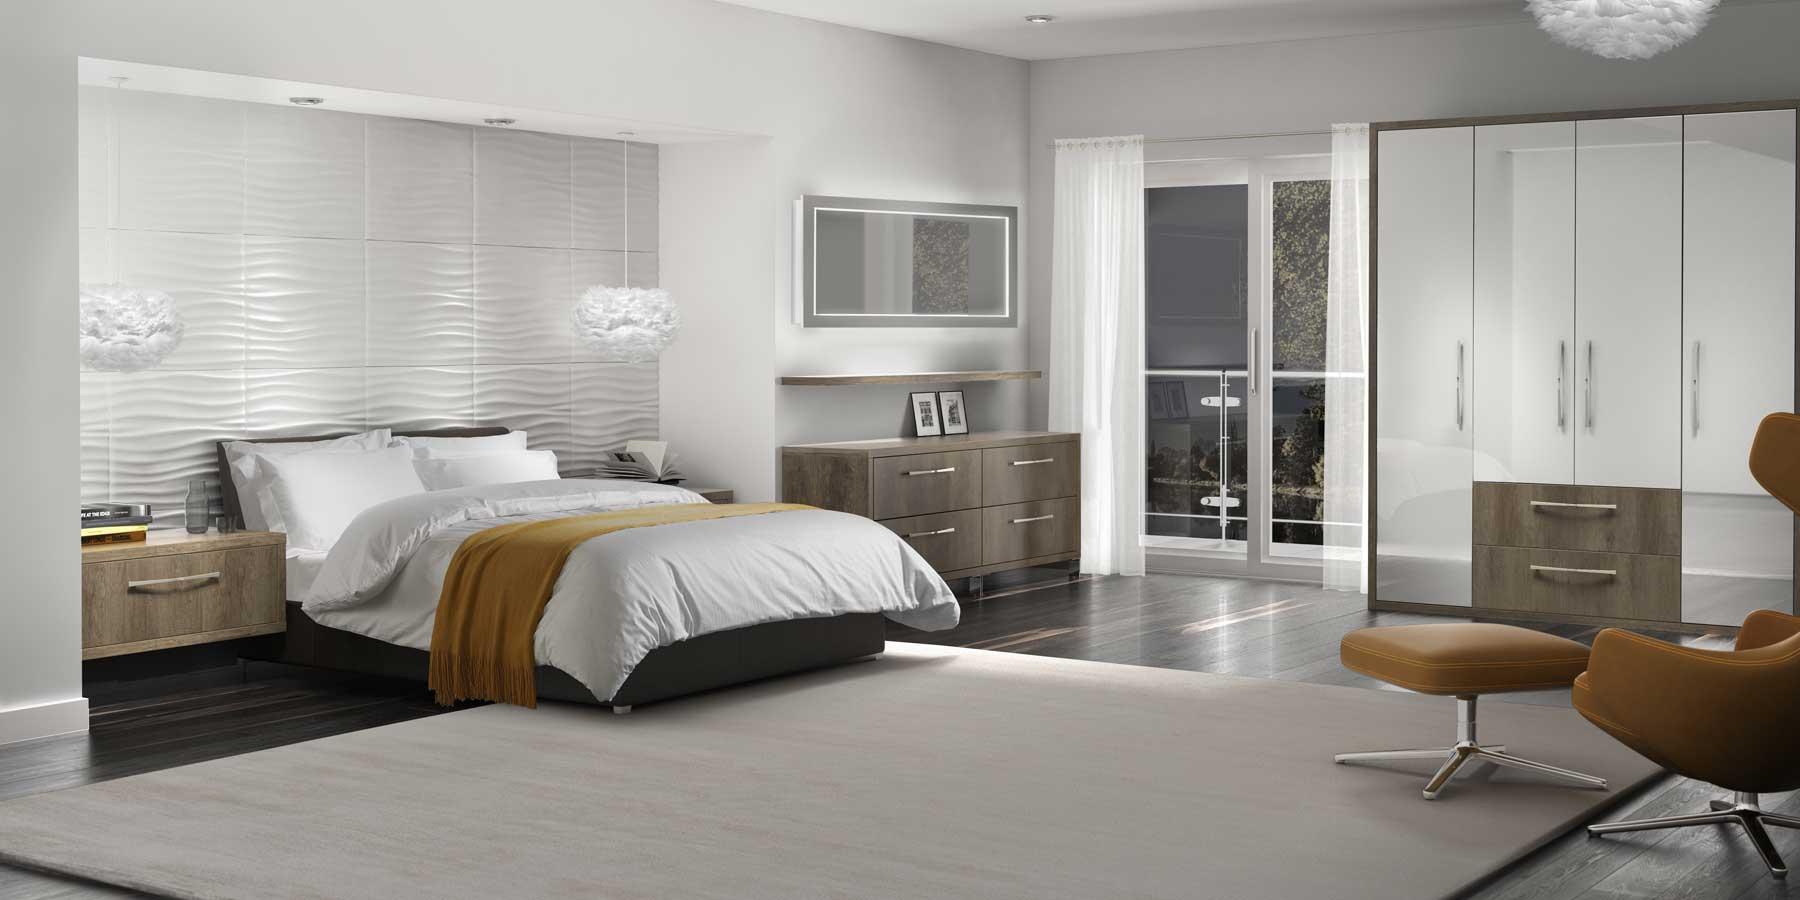 Bedroom Furniture Cardigan - Matt Dark Oak Solar Gloss White